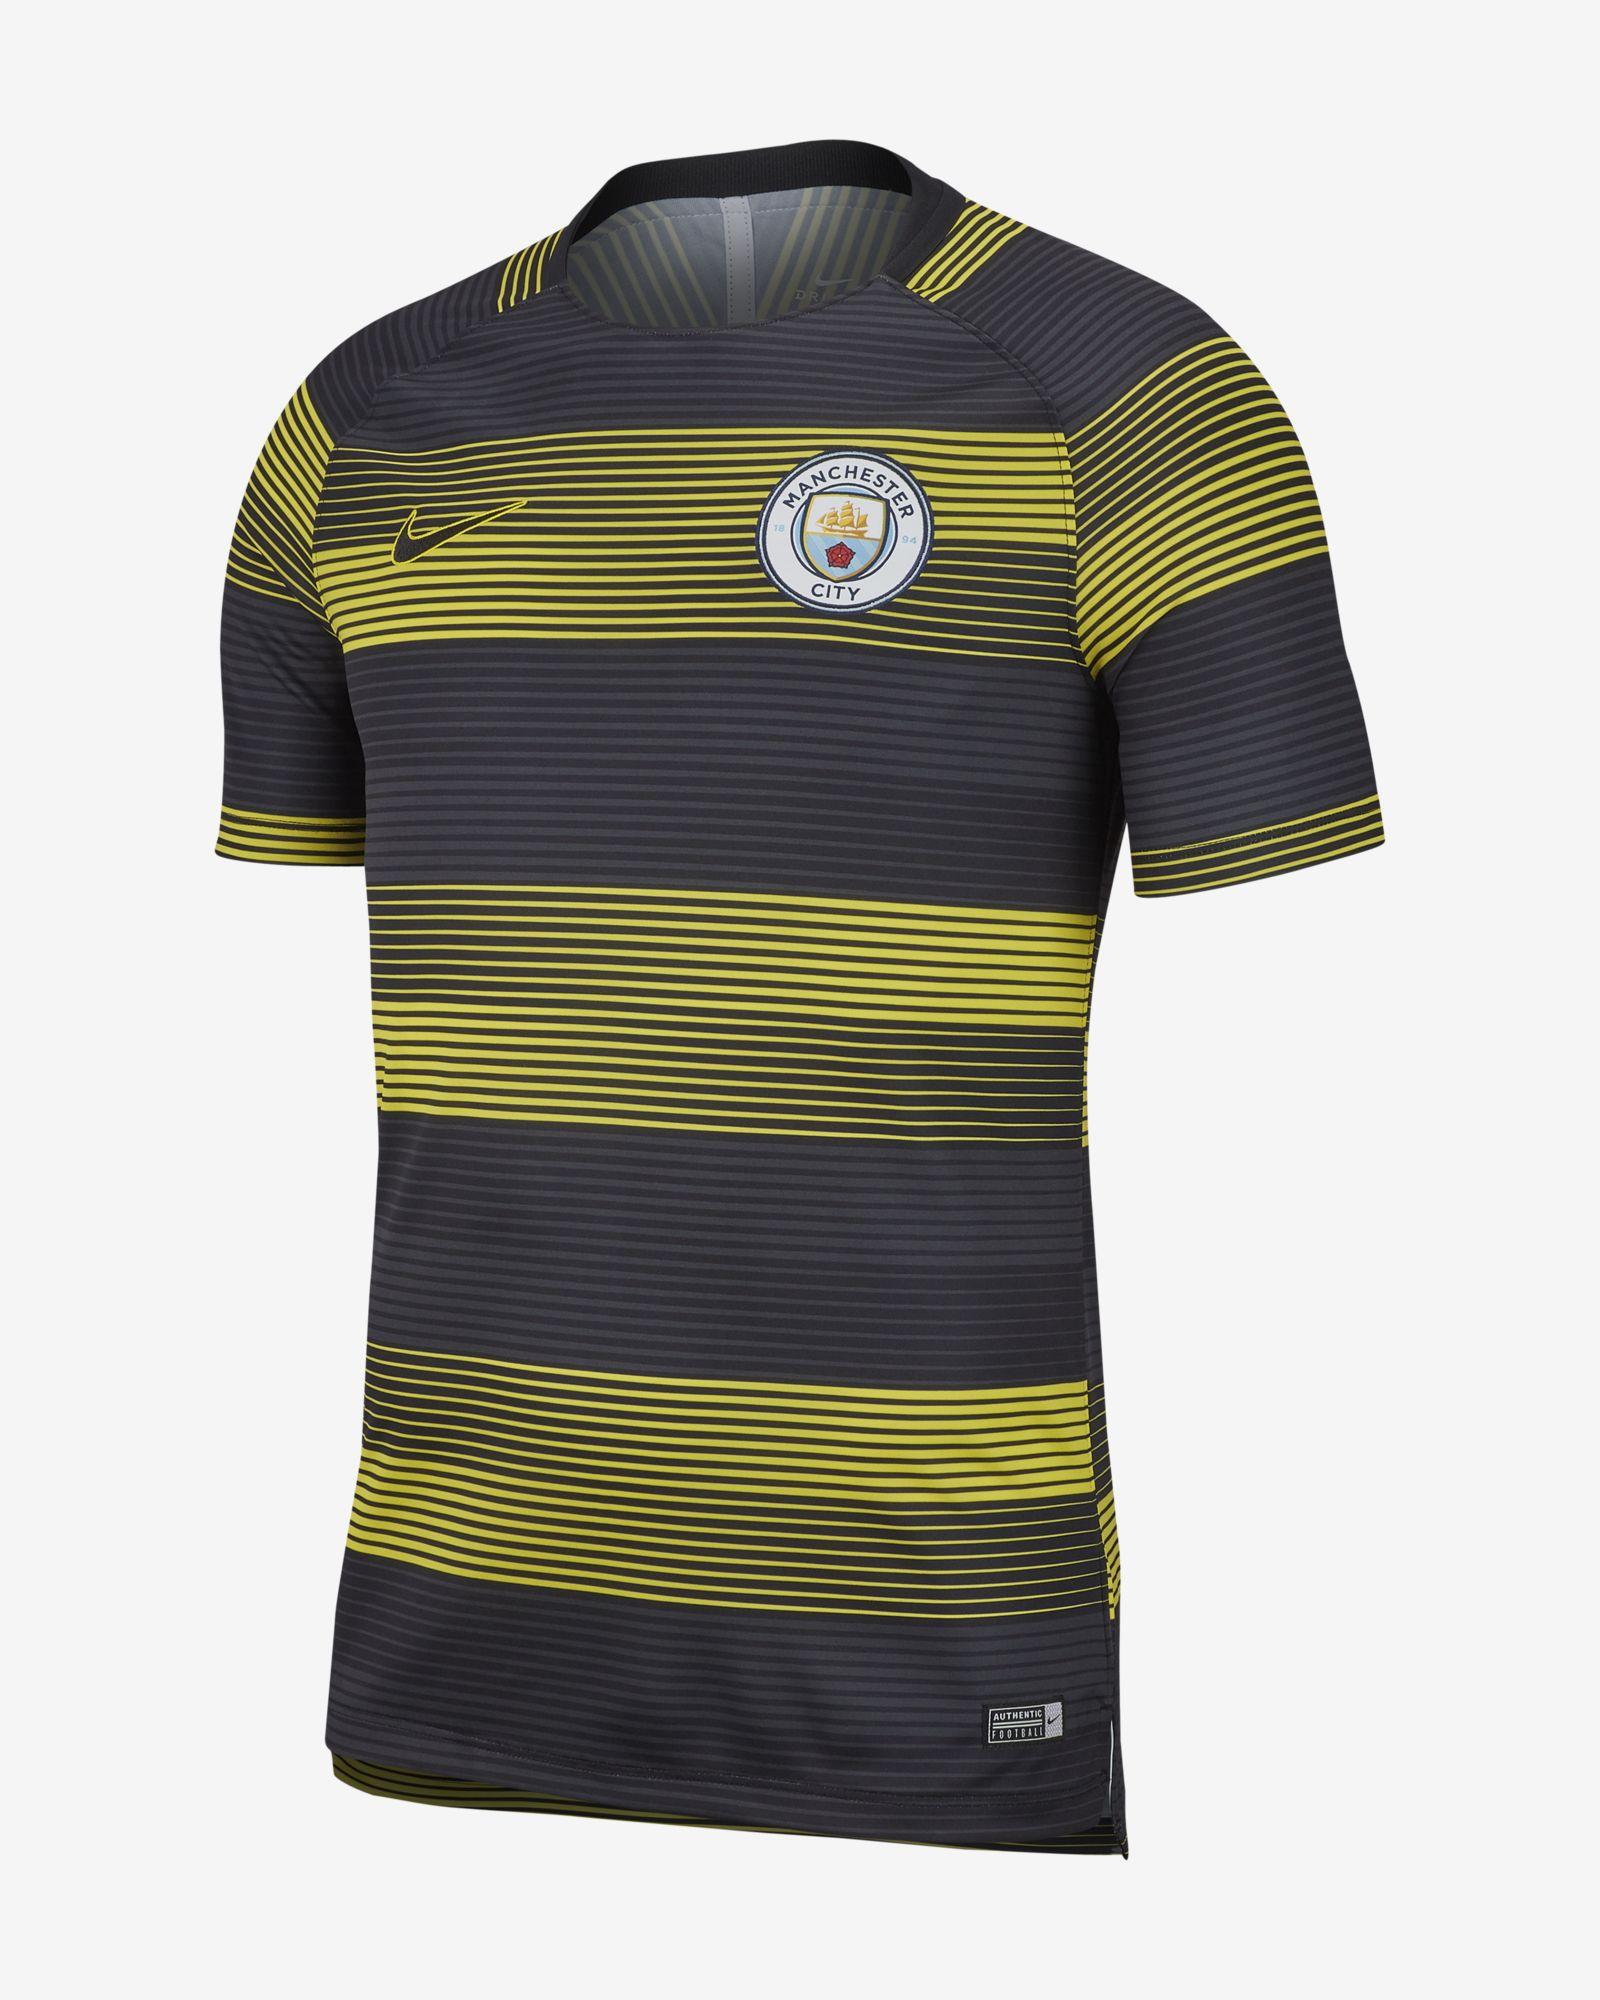 best sneakers 77582 0514d Manchester City FC Dri-FIT Squad Short Sleeve Football Top - Soccer Shop  Manchester City Merchandise - Superfanas.lt